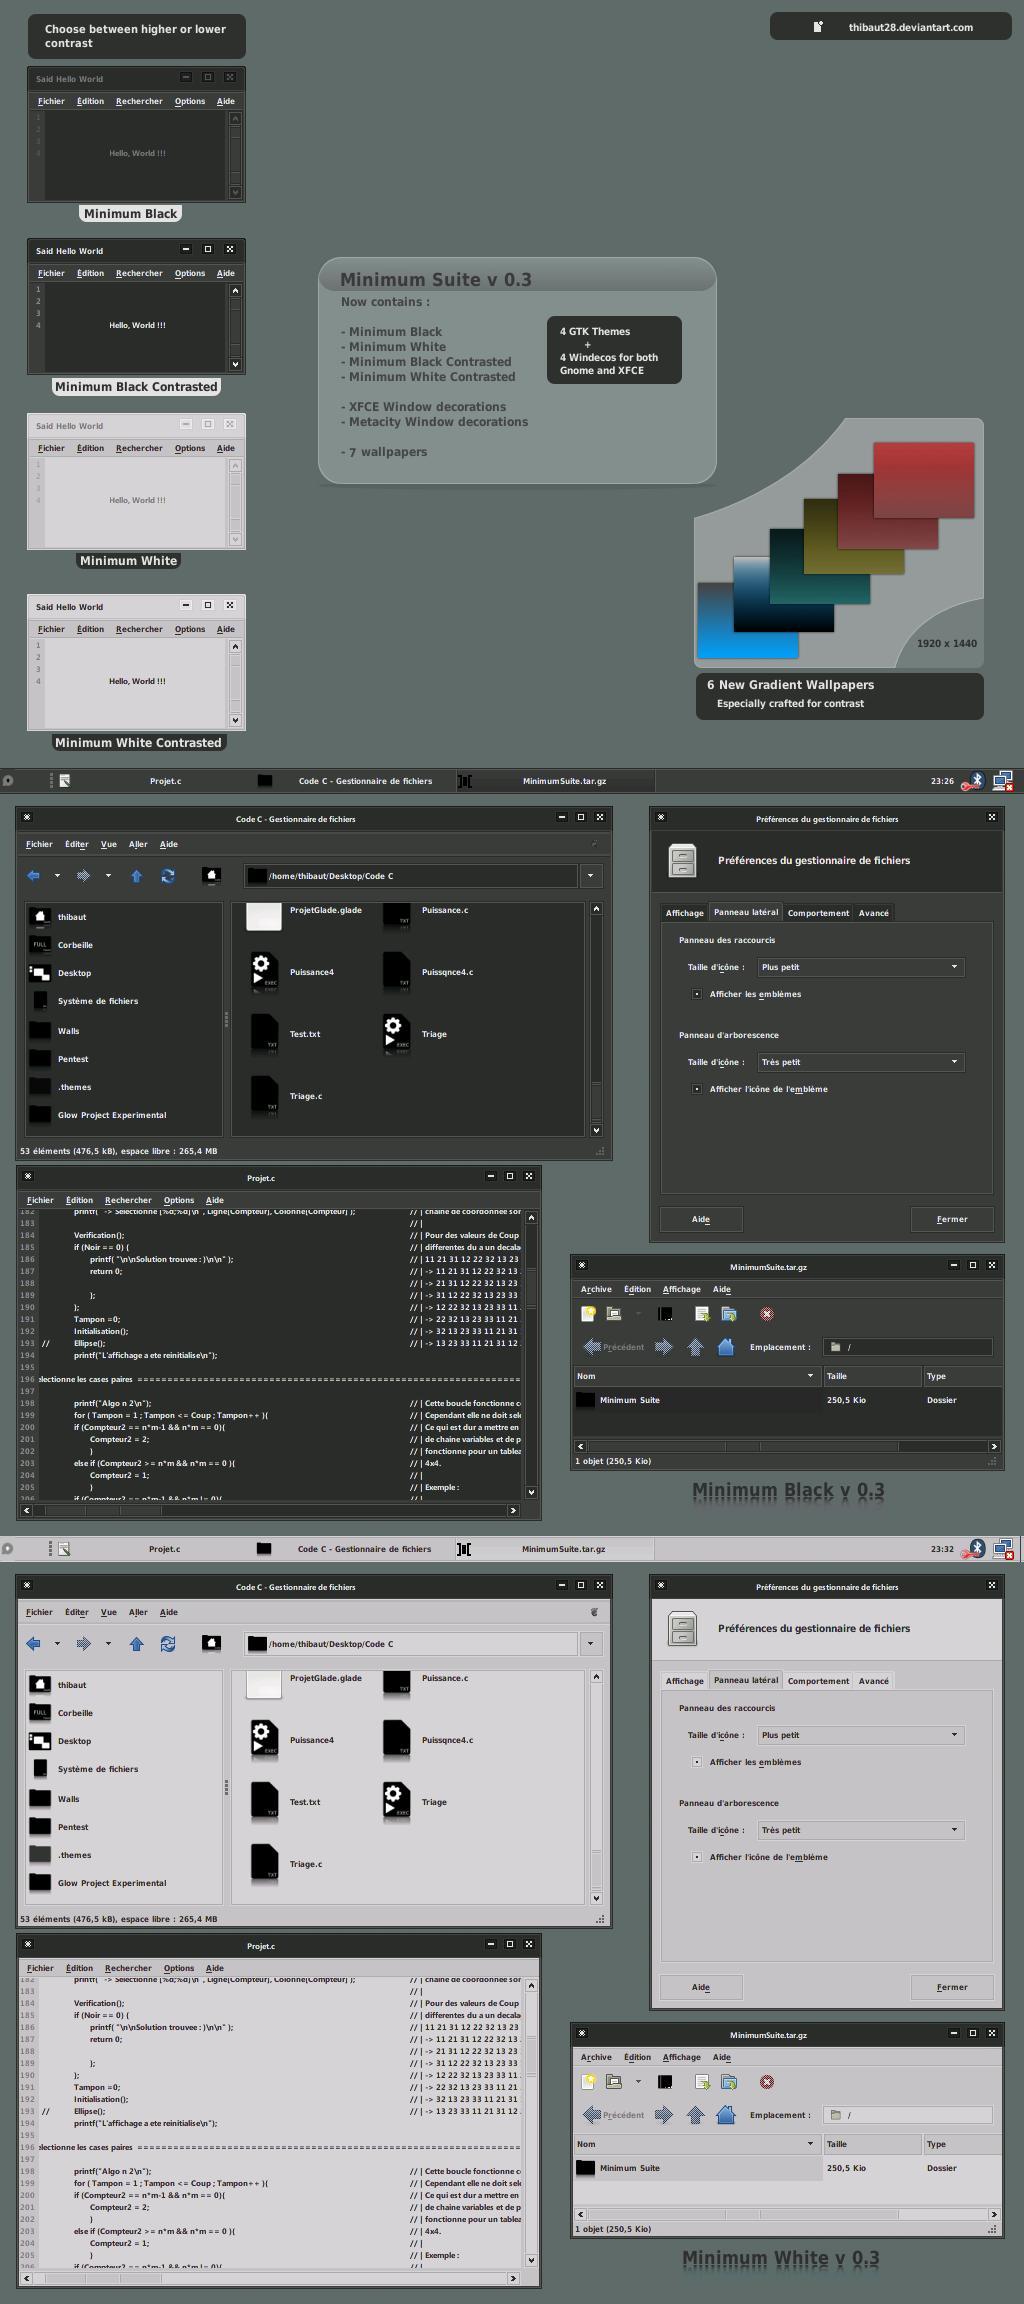 Minimum. Suite v 0.3 by thibaut28